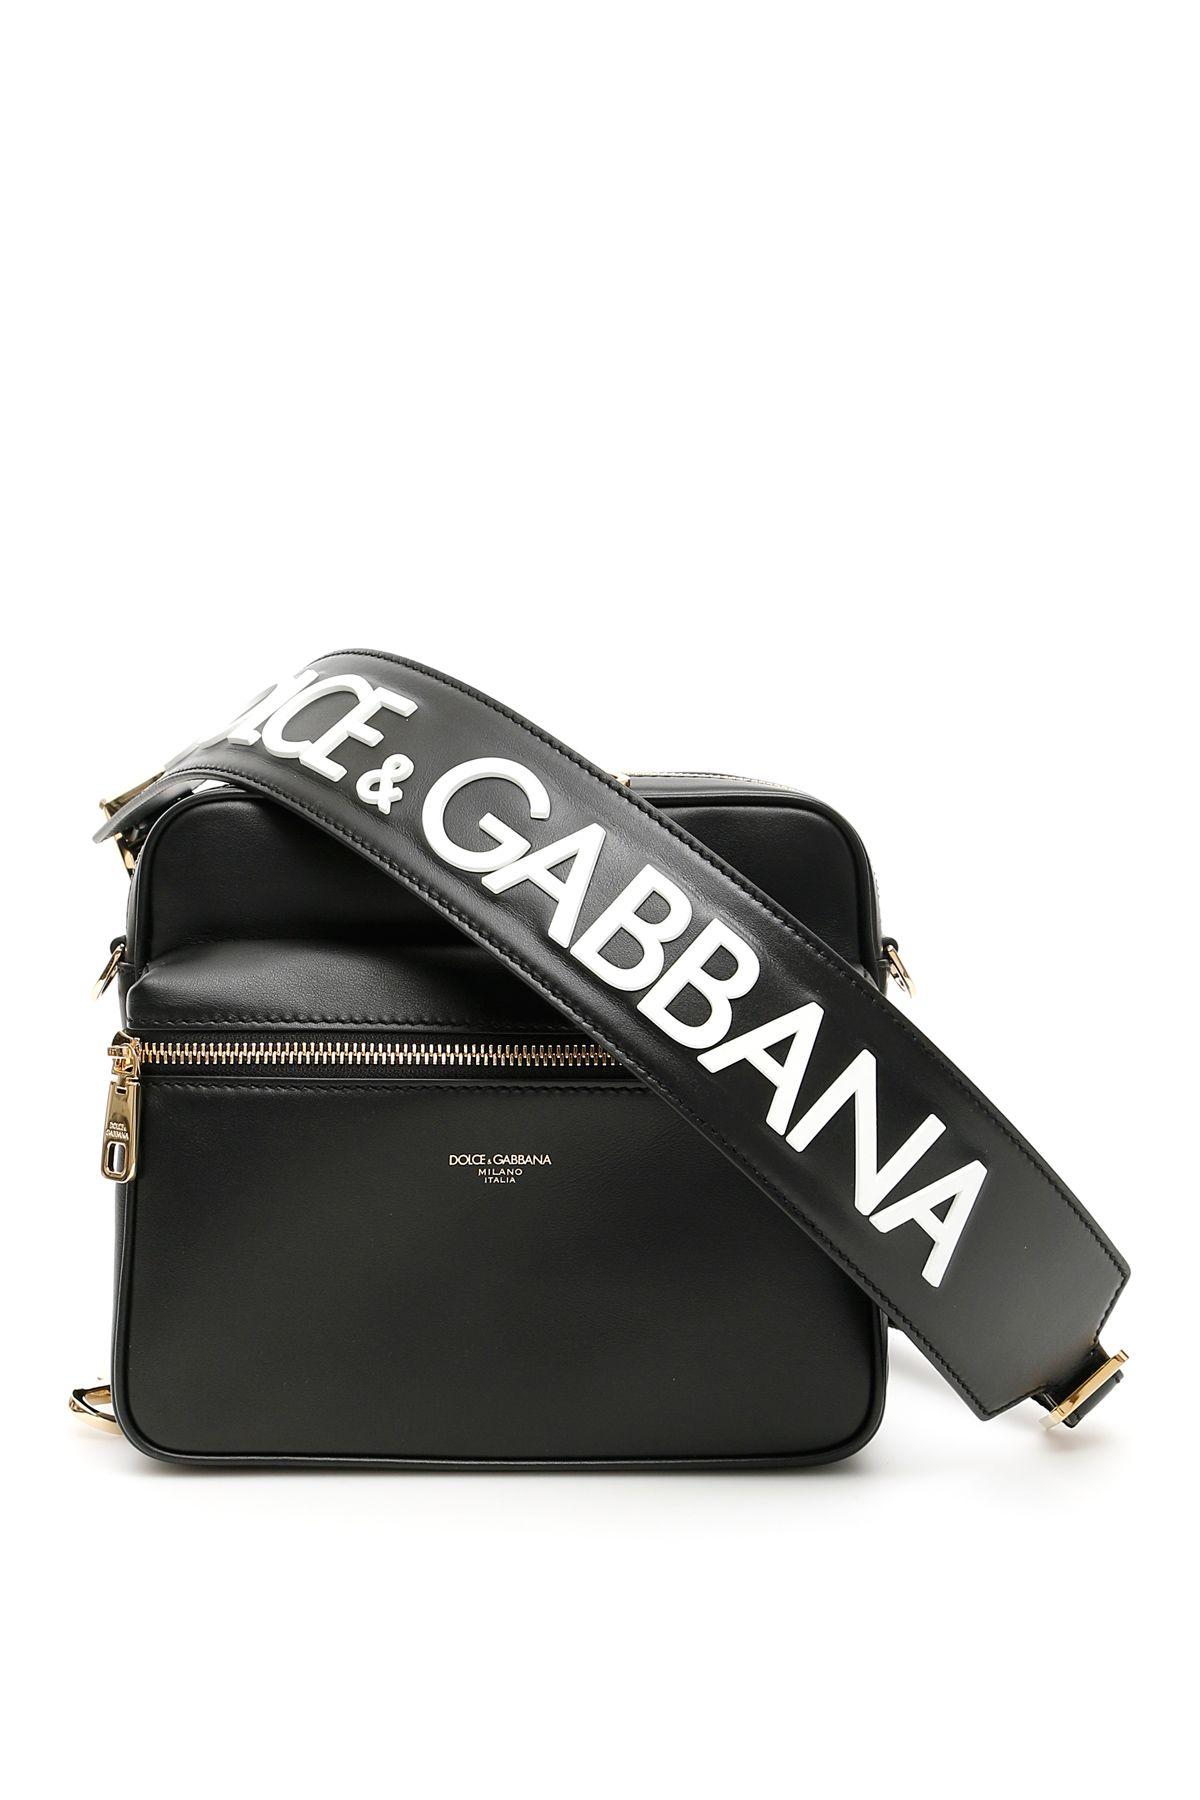 69ce9acc015 Dolce & Gabbana Dolce & Gabbana Logo Messenger Bag - D G FDO NERO ...